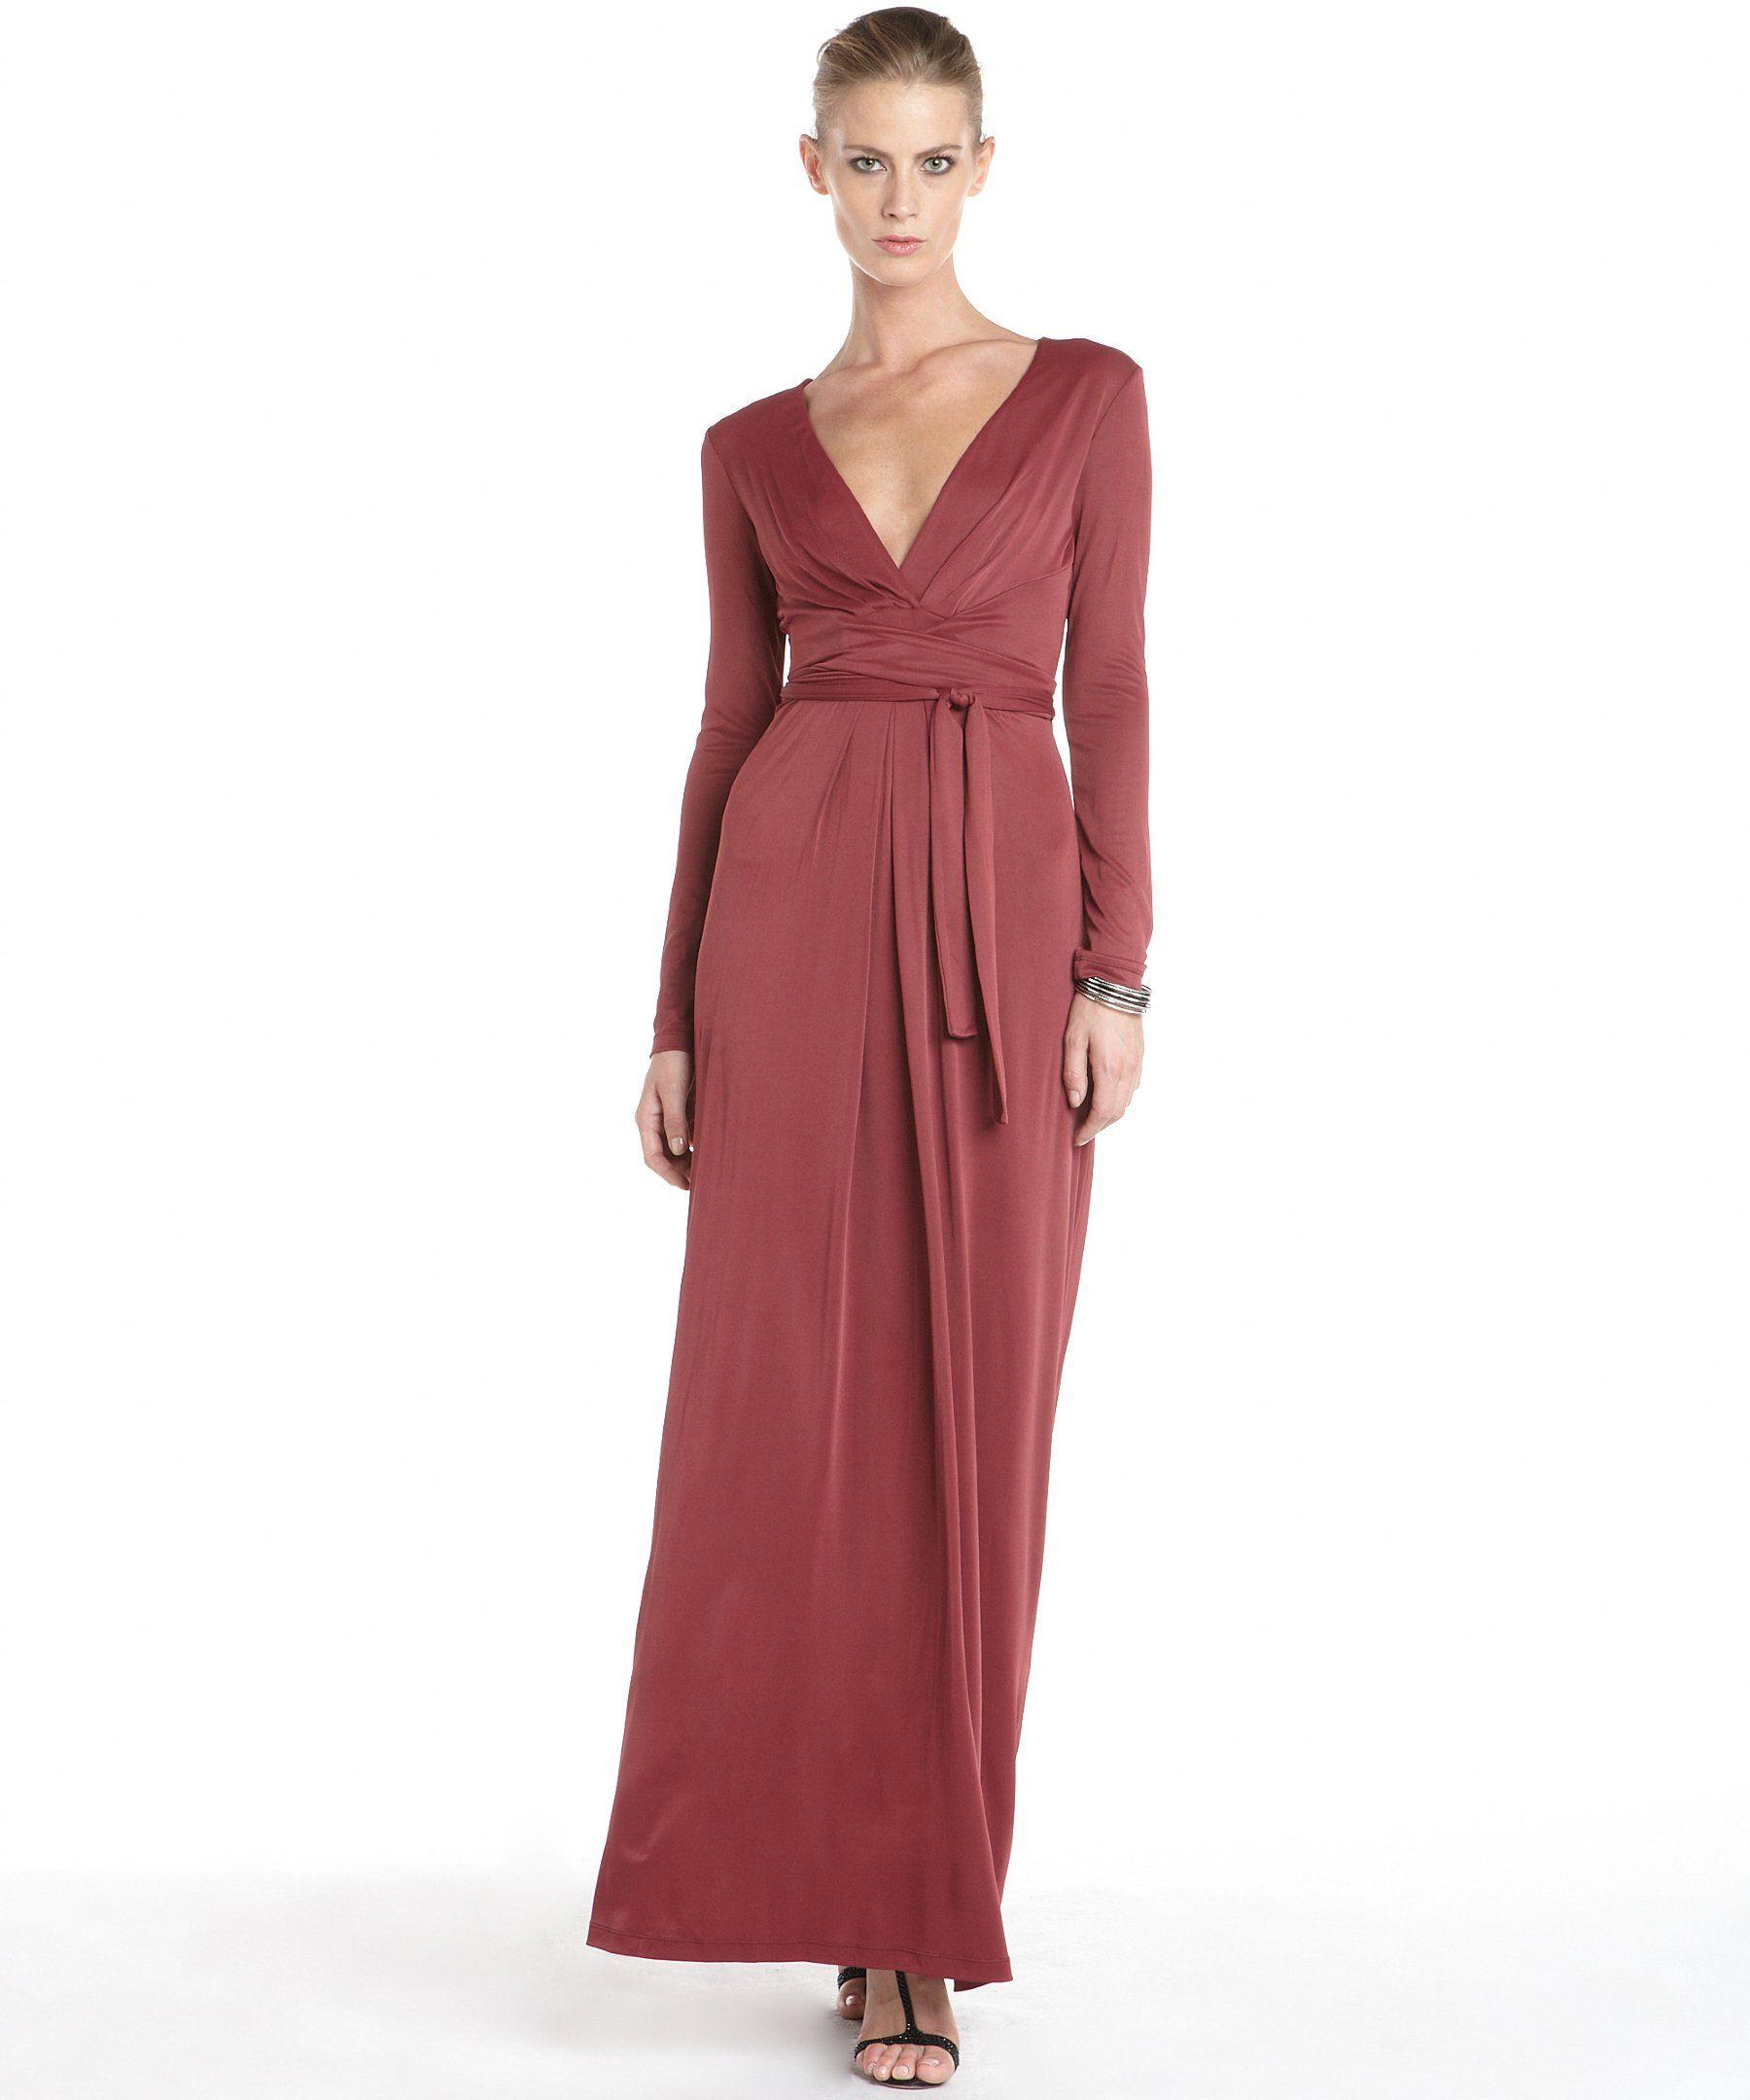 2b9ed6df7ea1 BCBGMAXAZRIA wine stretch v-neck long sleeve maxi wrap dress ...